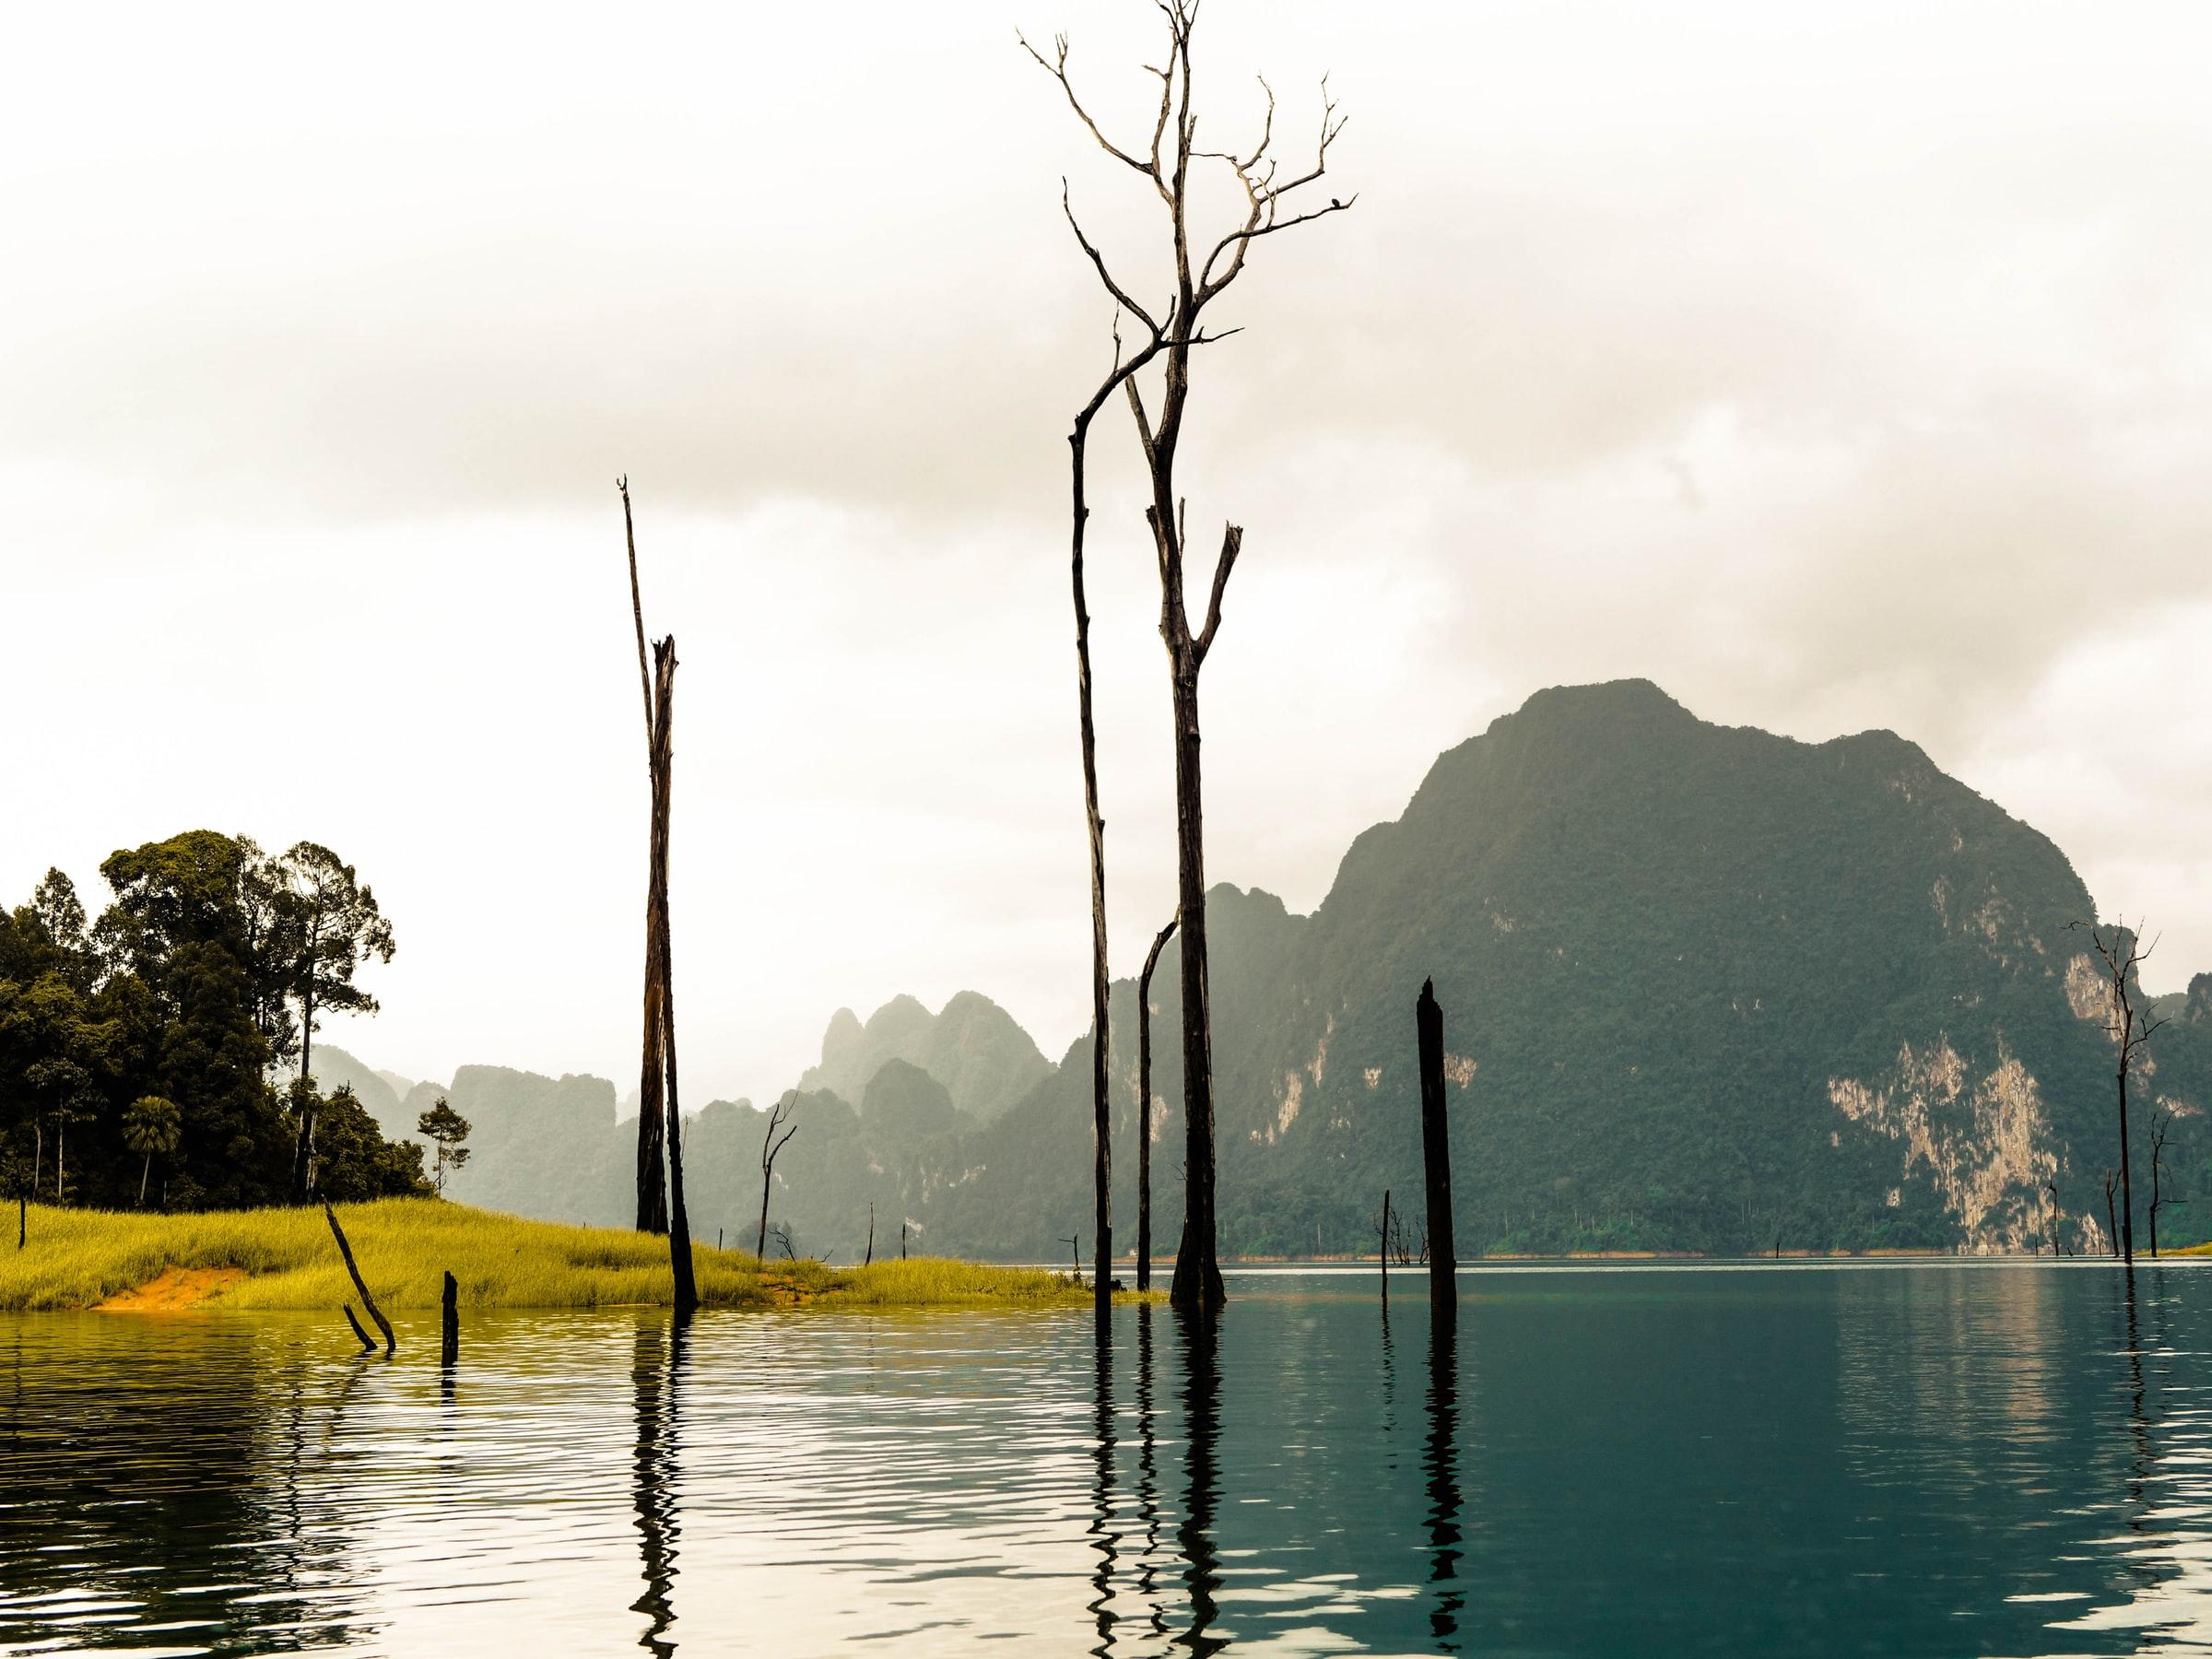 Thailand Regensaison Wasser Bäume Berge